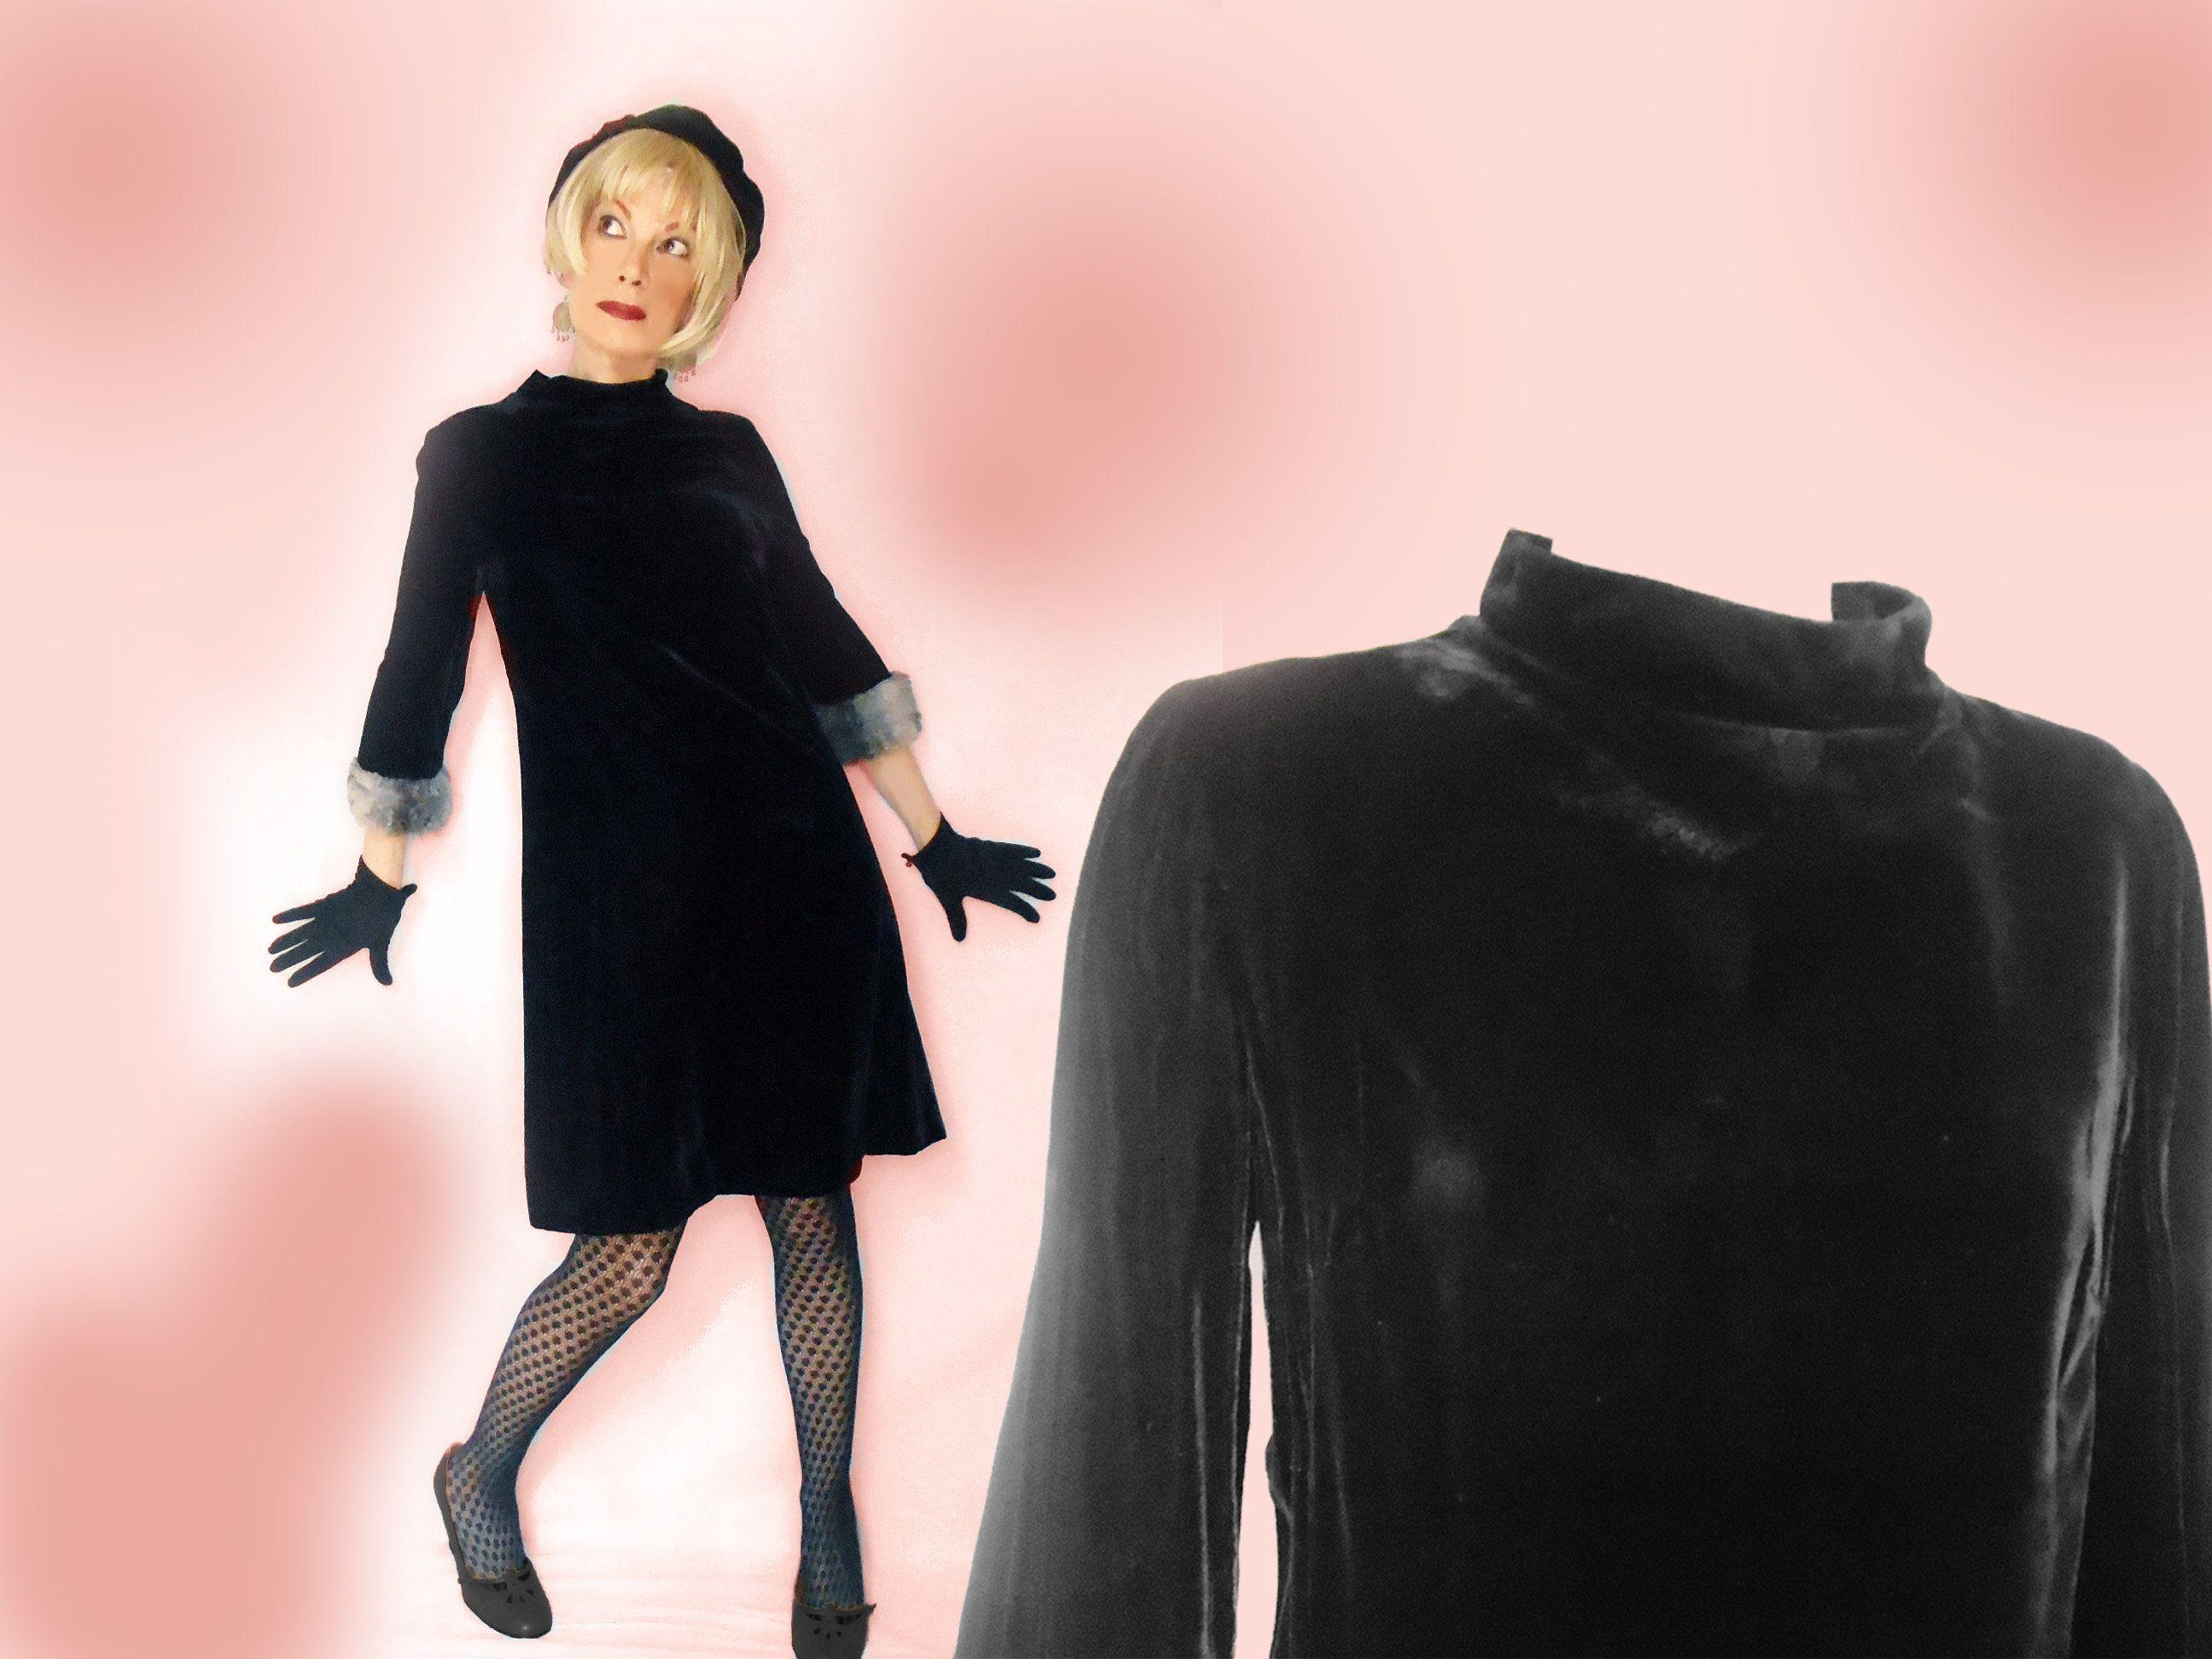 60s Vintage Mod Dress Black Velvet A Line With Sleeves Faux Fur Cuffs Little Black Dress Minimalist Fall Winter Fashion Womens Medium Vintage Mod Dress Mod Dress Fashion [ 1944 x 2592 Pixel ]